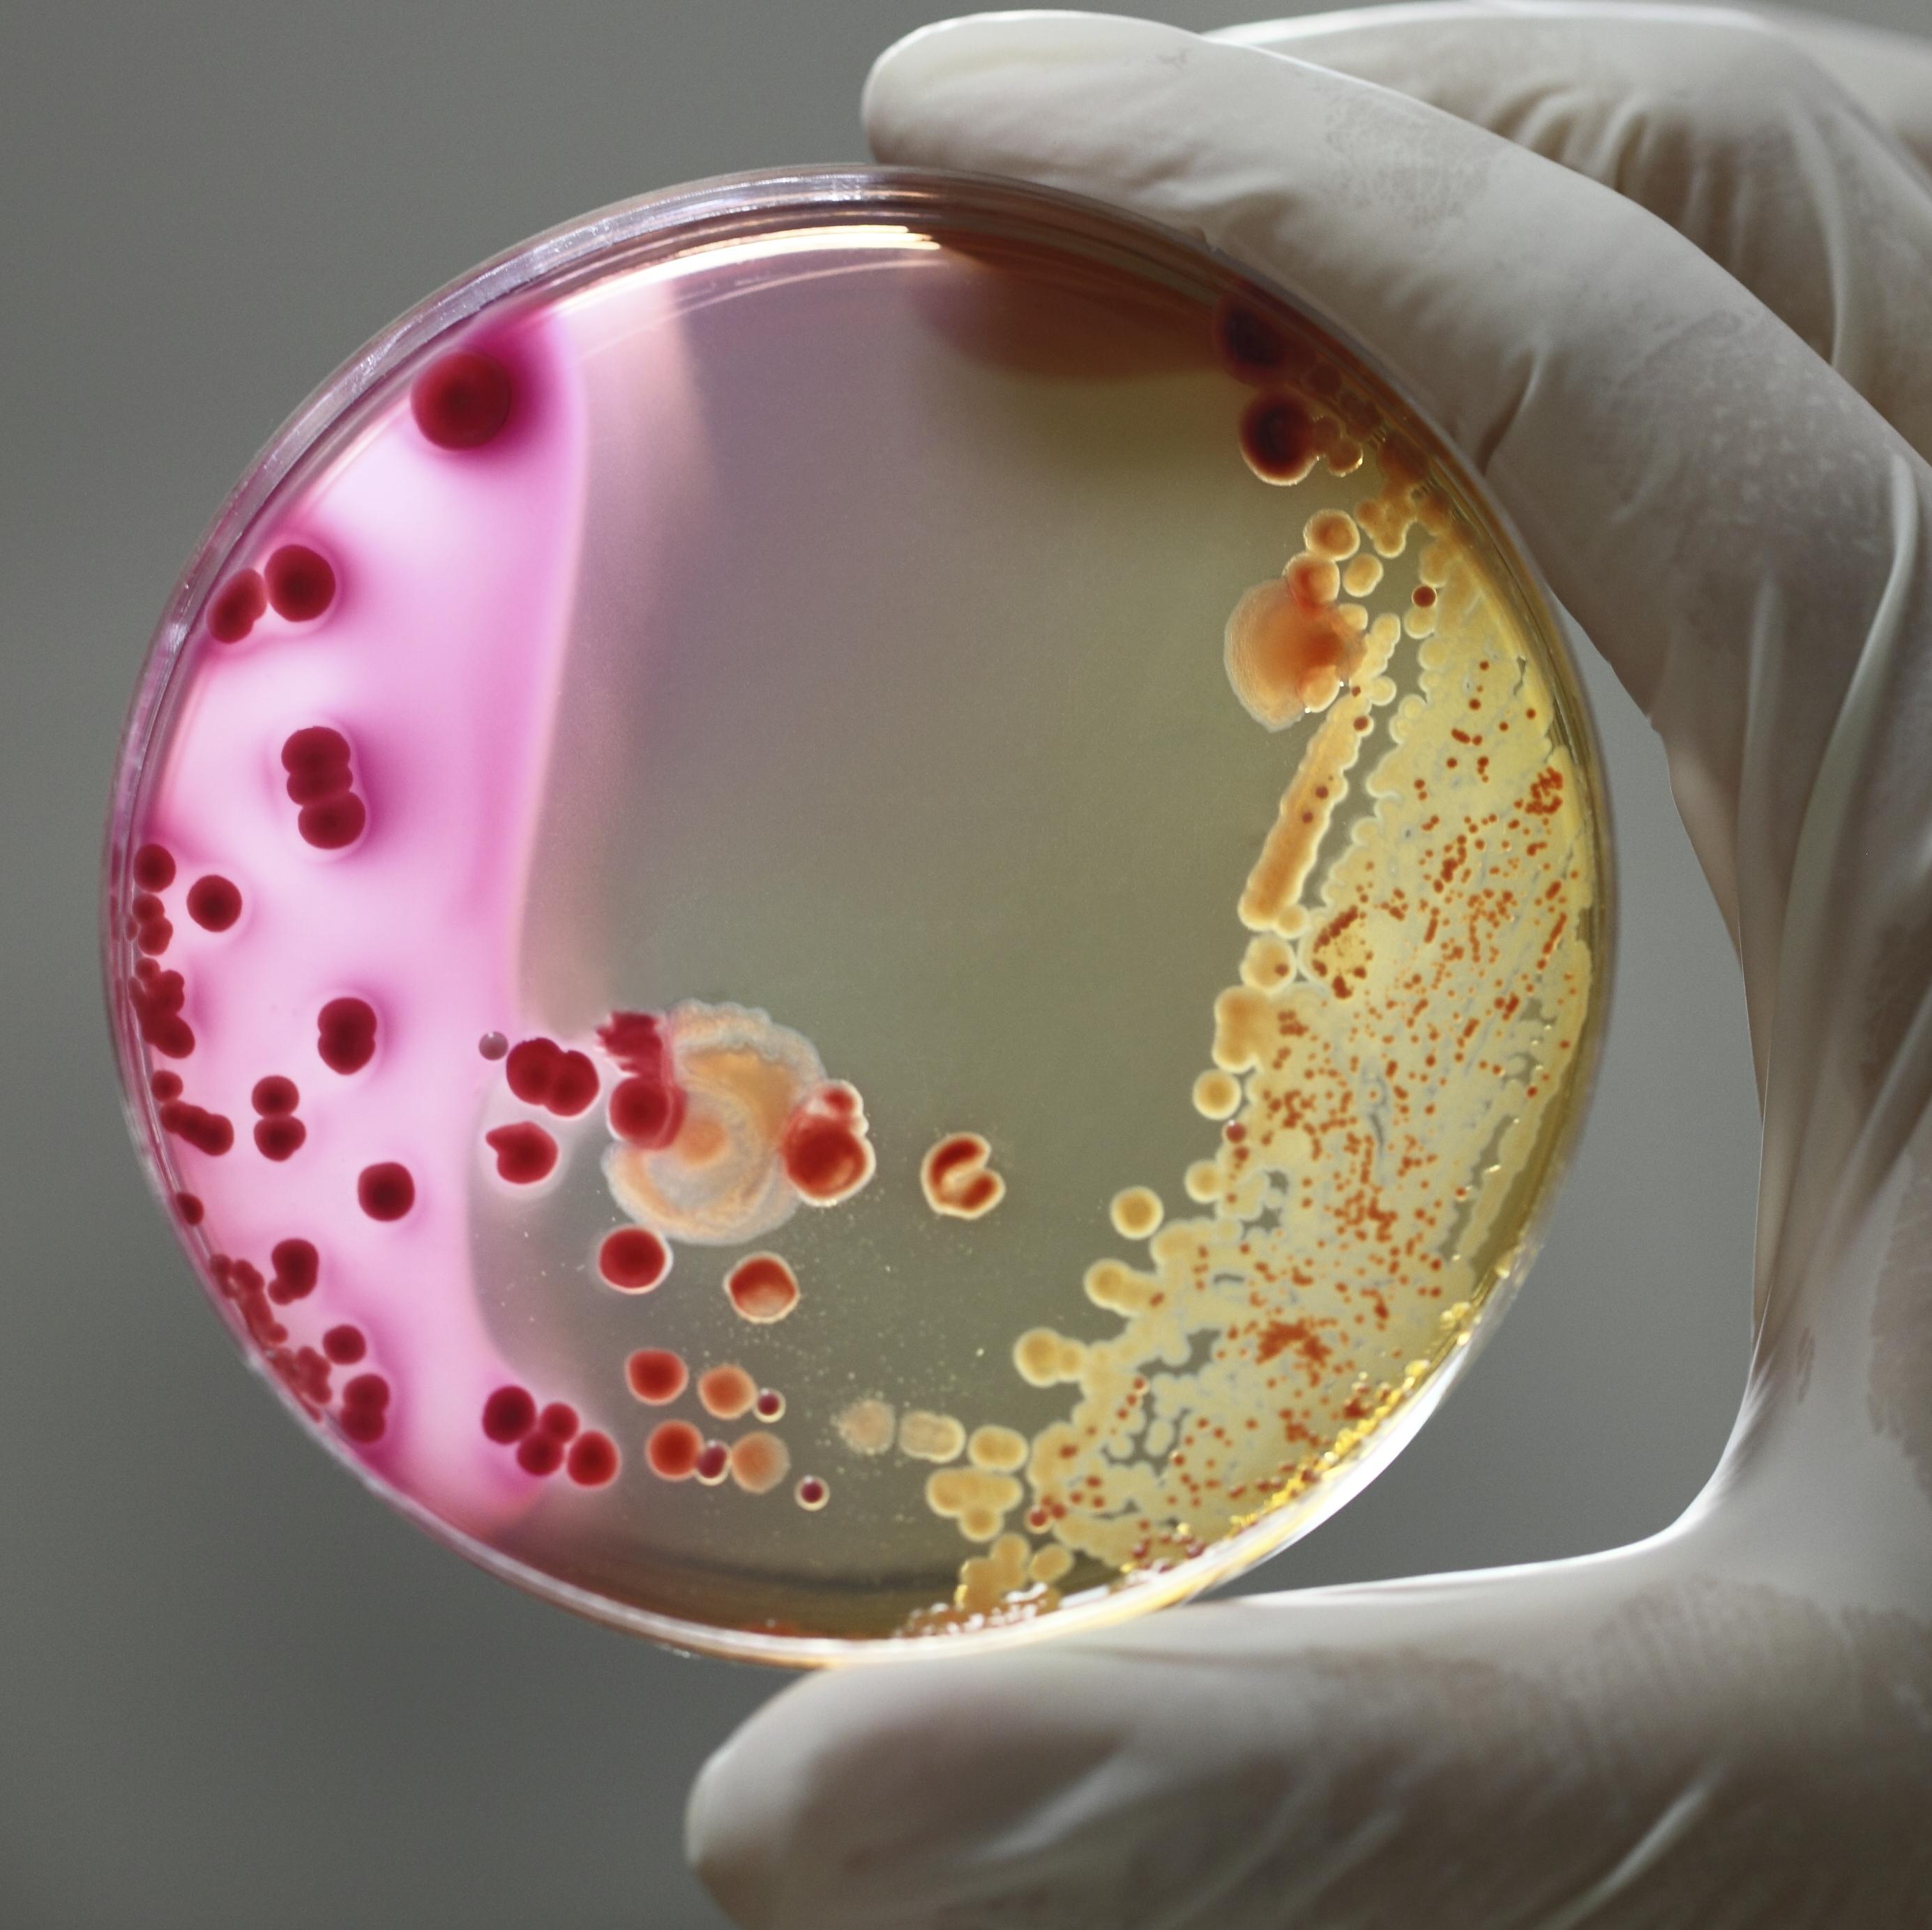 Maternal Bacteria Linked To Pretermborn's Health